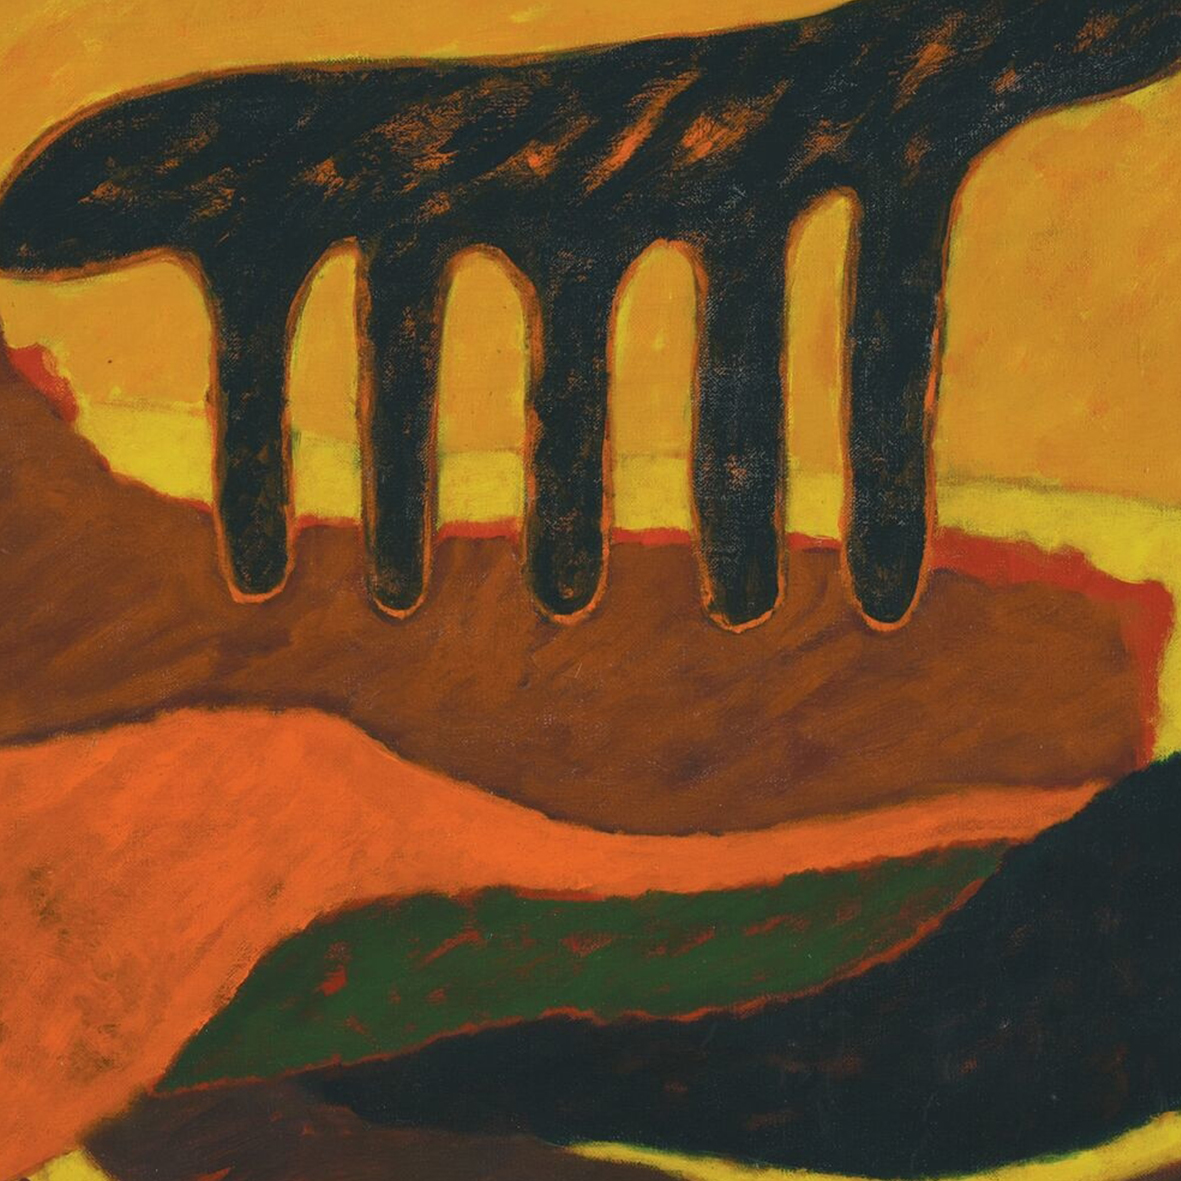 Nashar, Irama, oil on canvas, 70 x 91 cm, 1989 (detail)